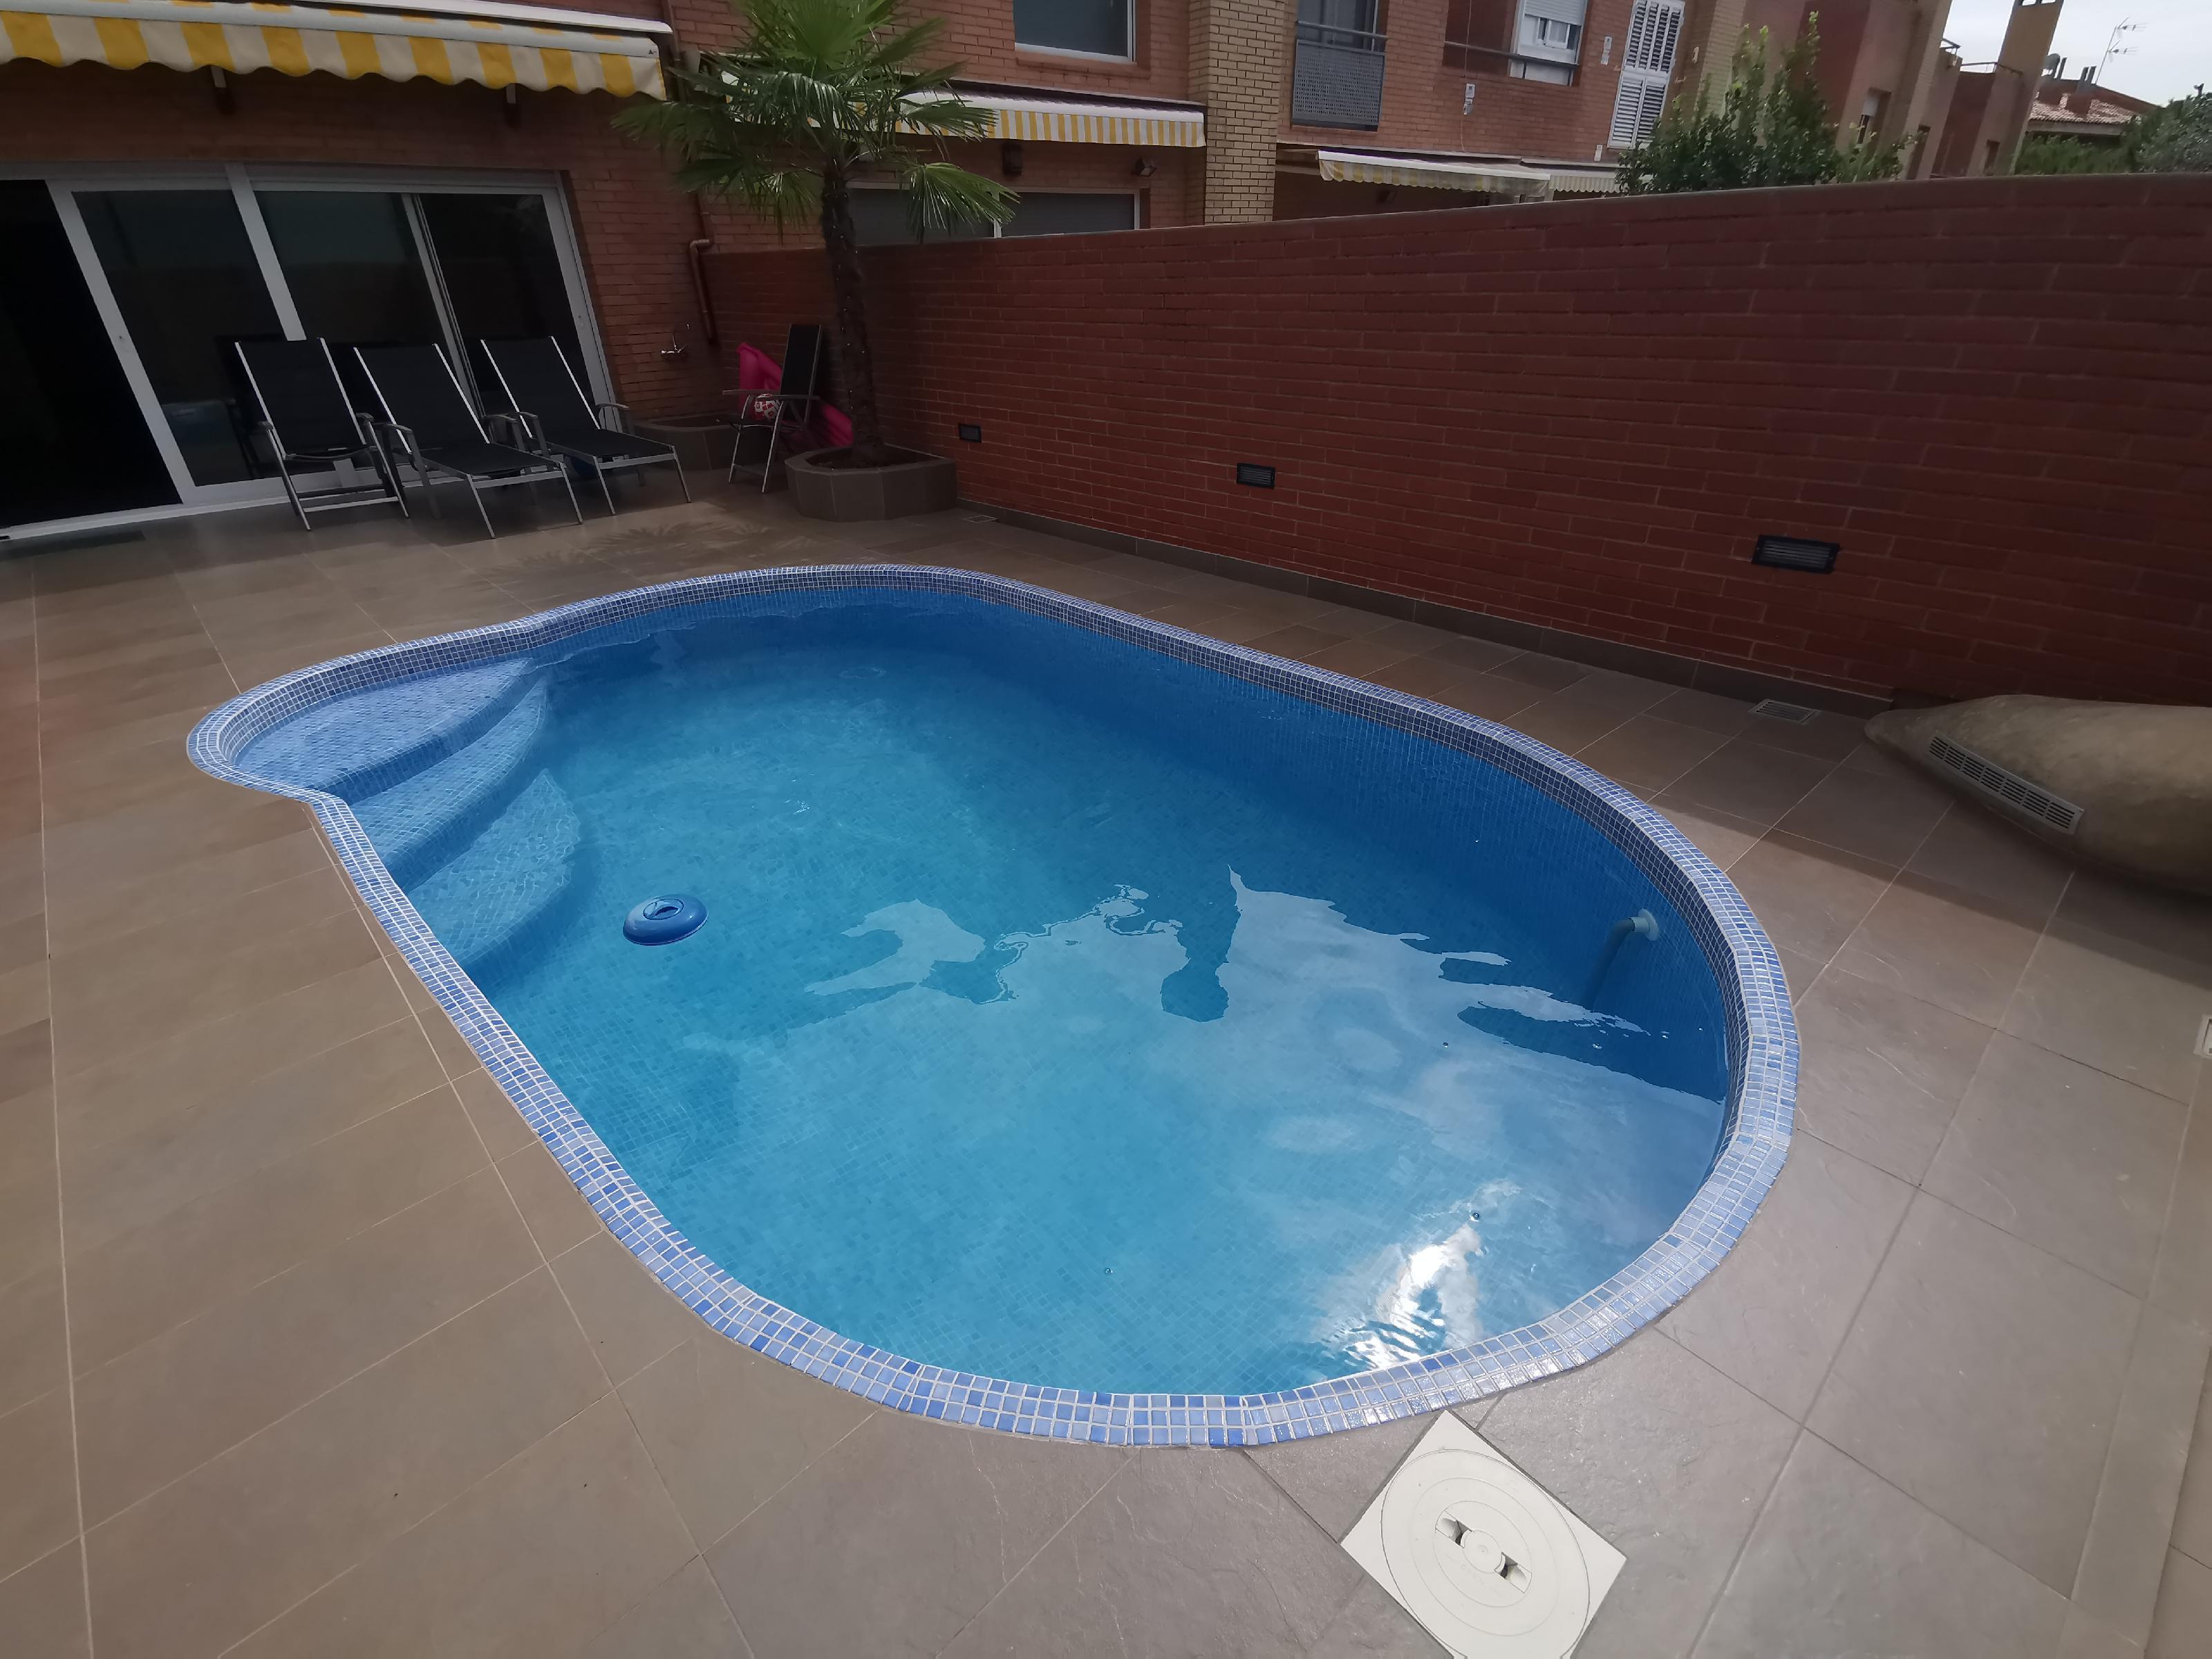 Imagen 2 Casa Adosada en venta en Badalona / Bonavista badalona